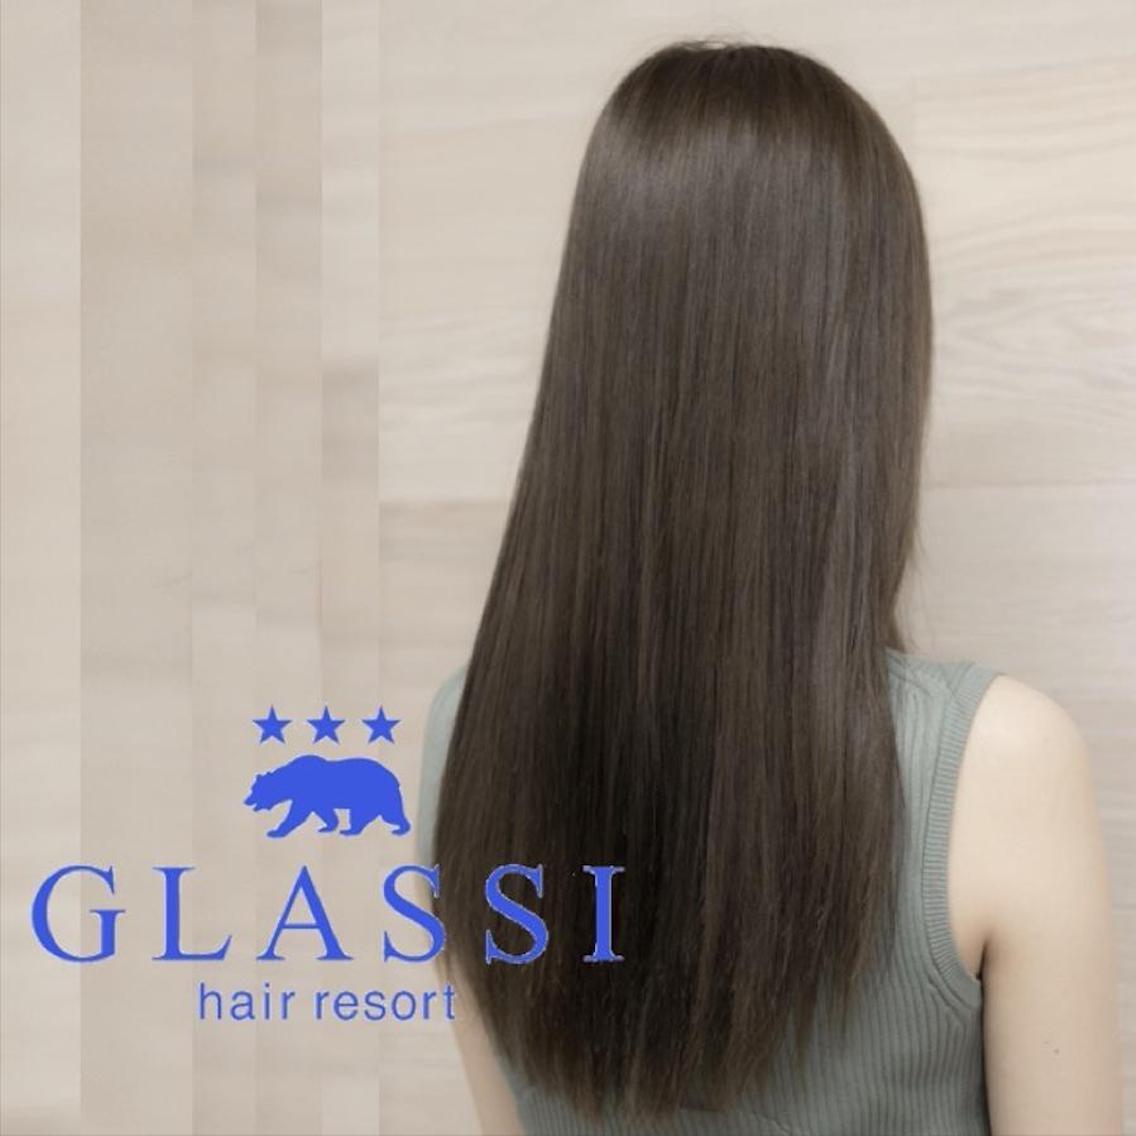 GLASSIセンター南店【グラッシー】所属・村山武史の掲載